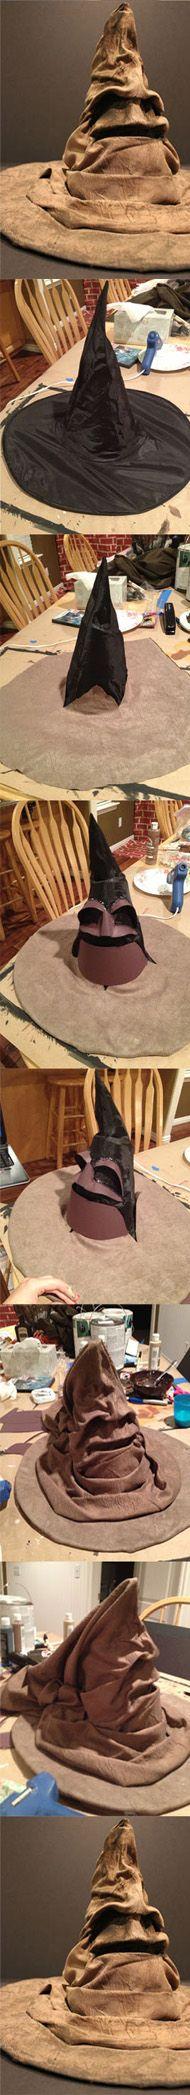 DIY Harry Potter Sorting Hat